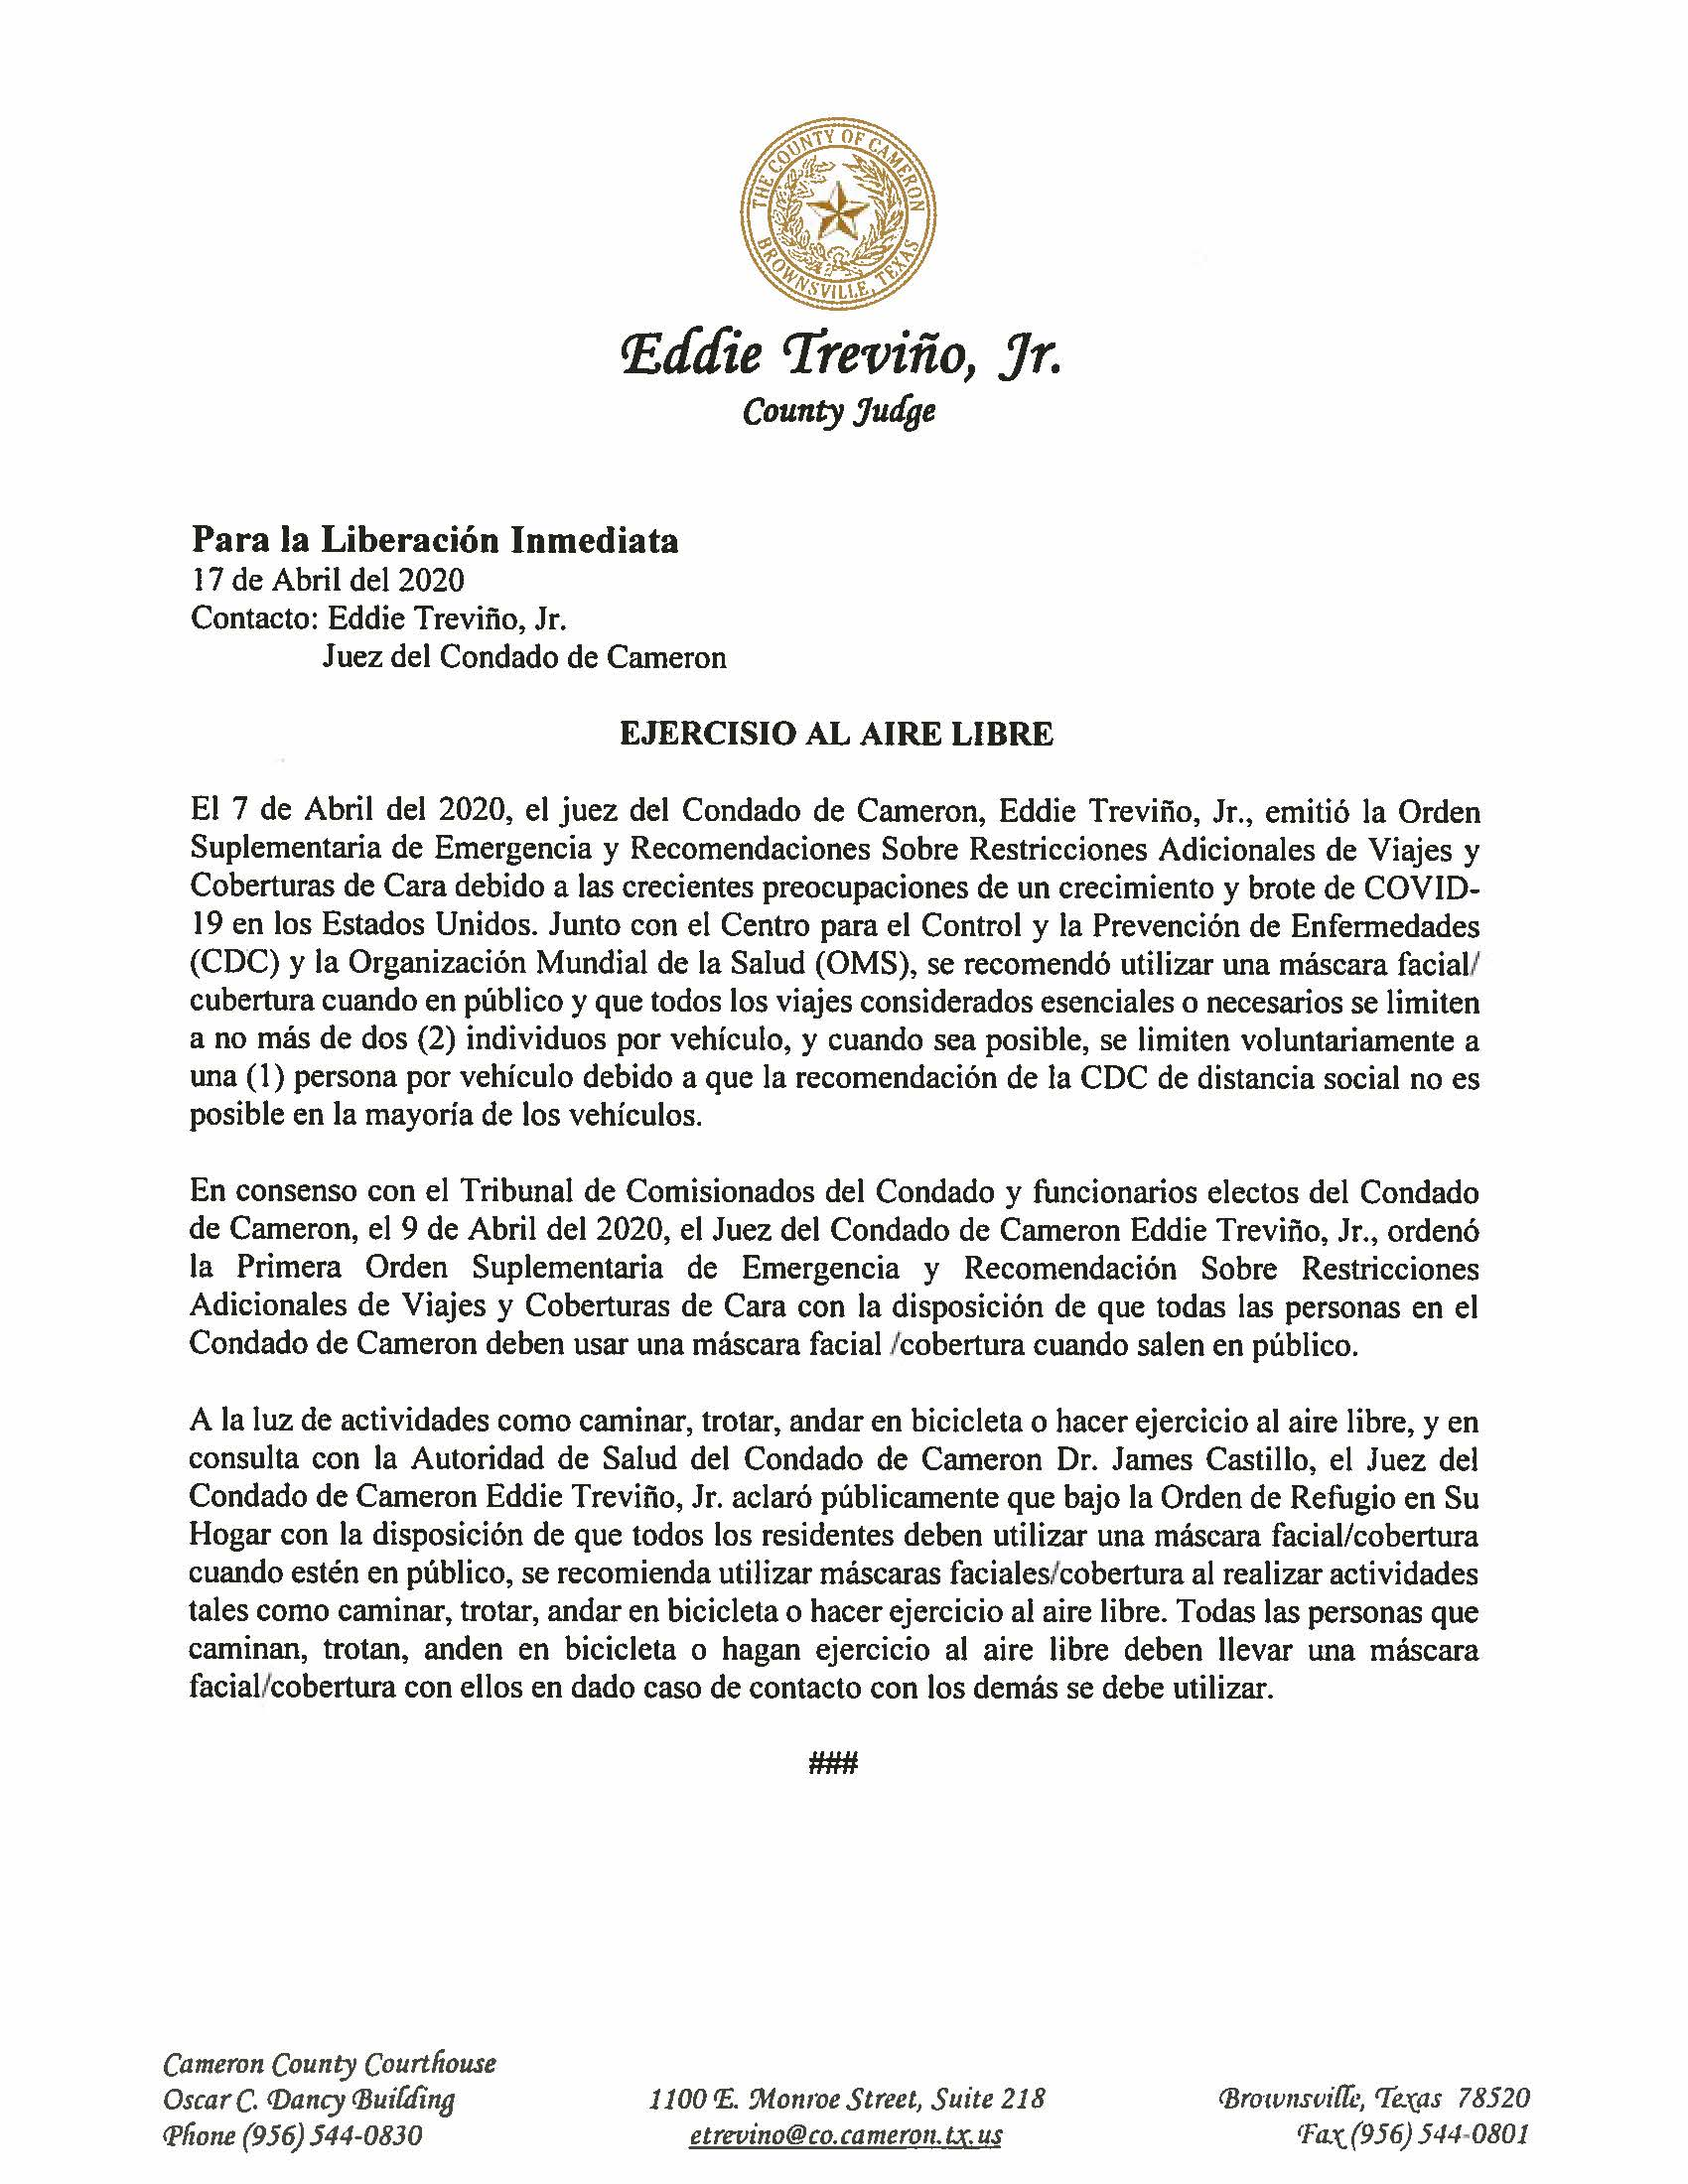 04.17.2020 Para La Liberacion Inmediata Ejercisio Al Aire Libre